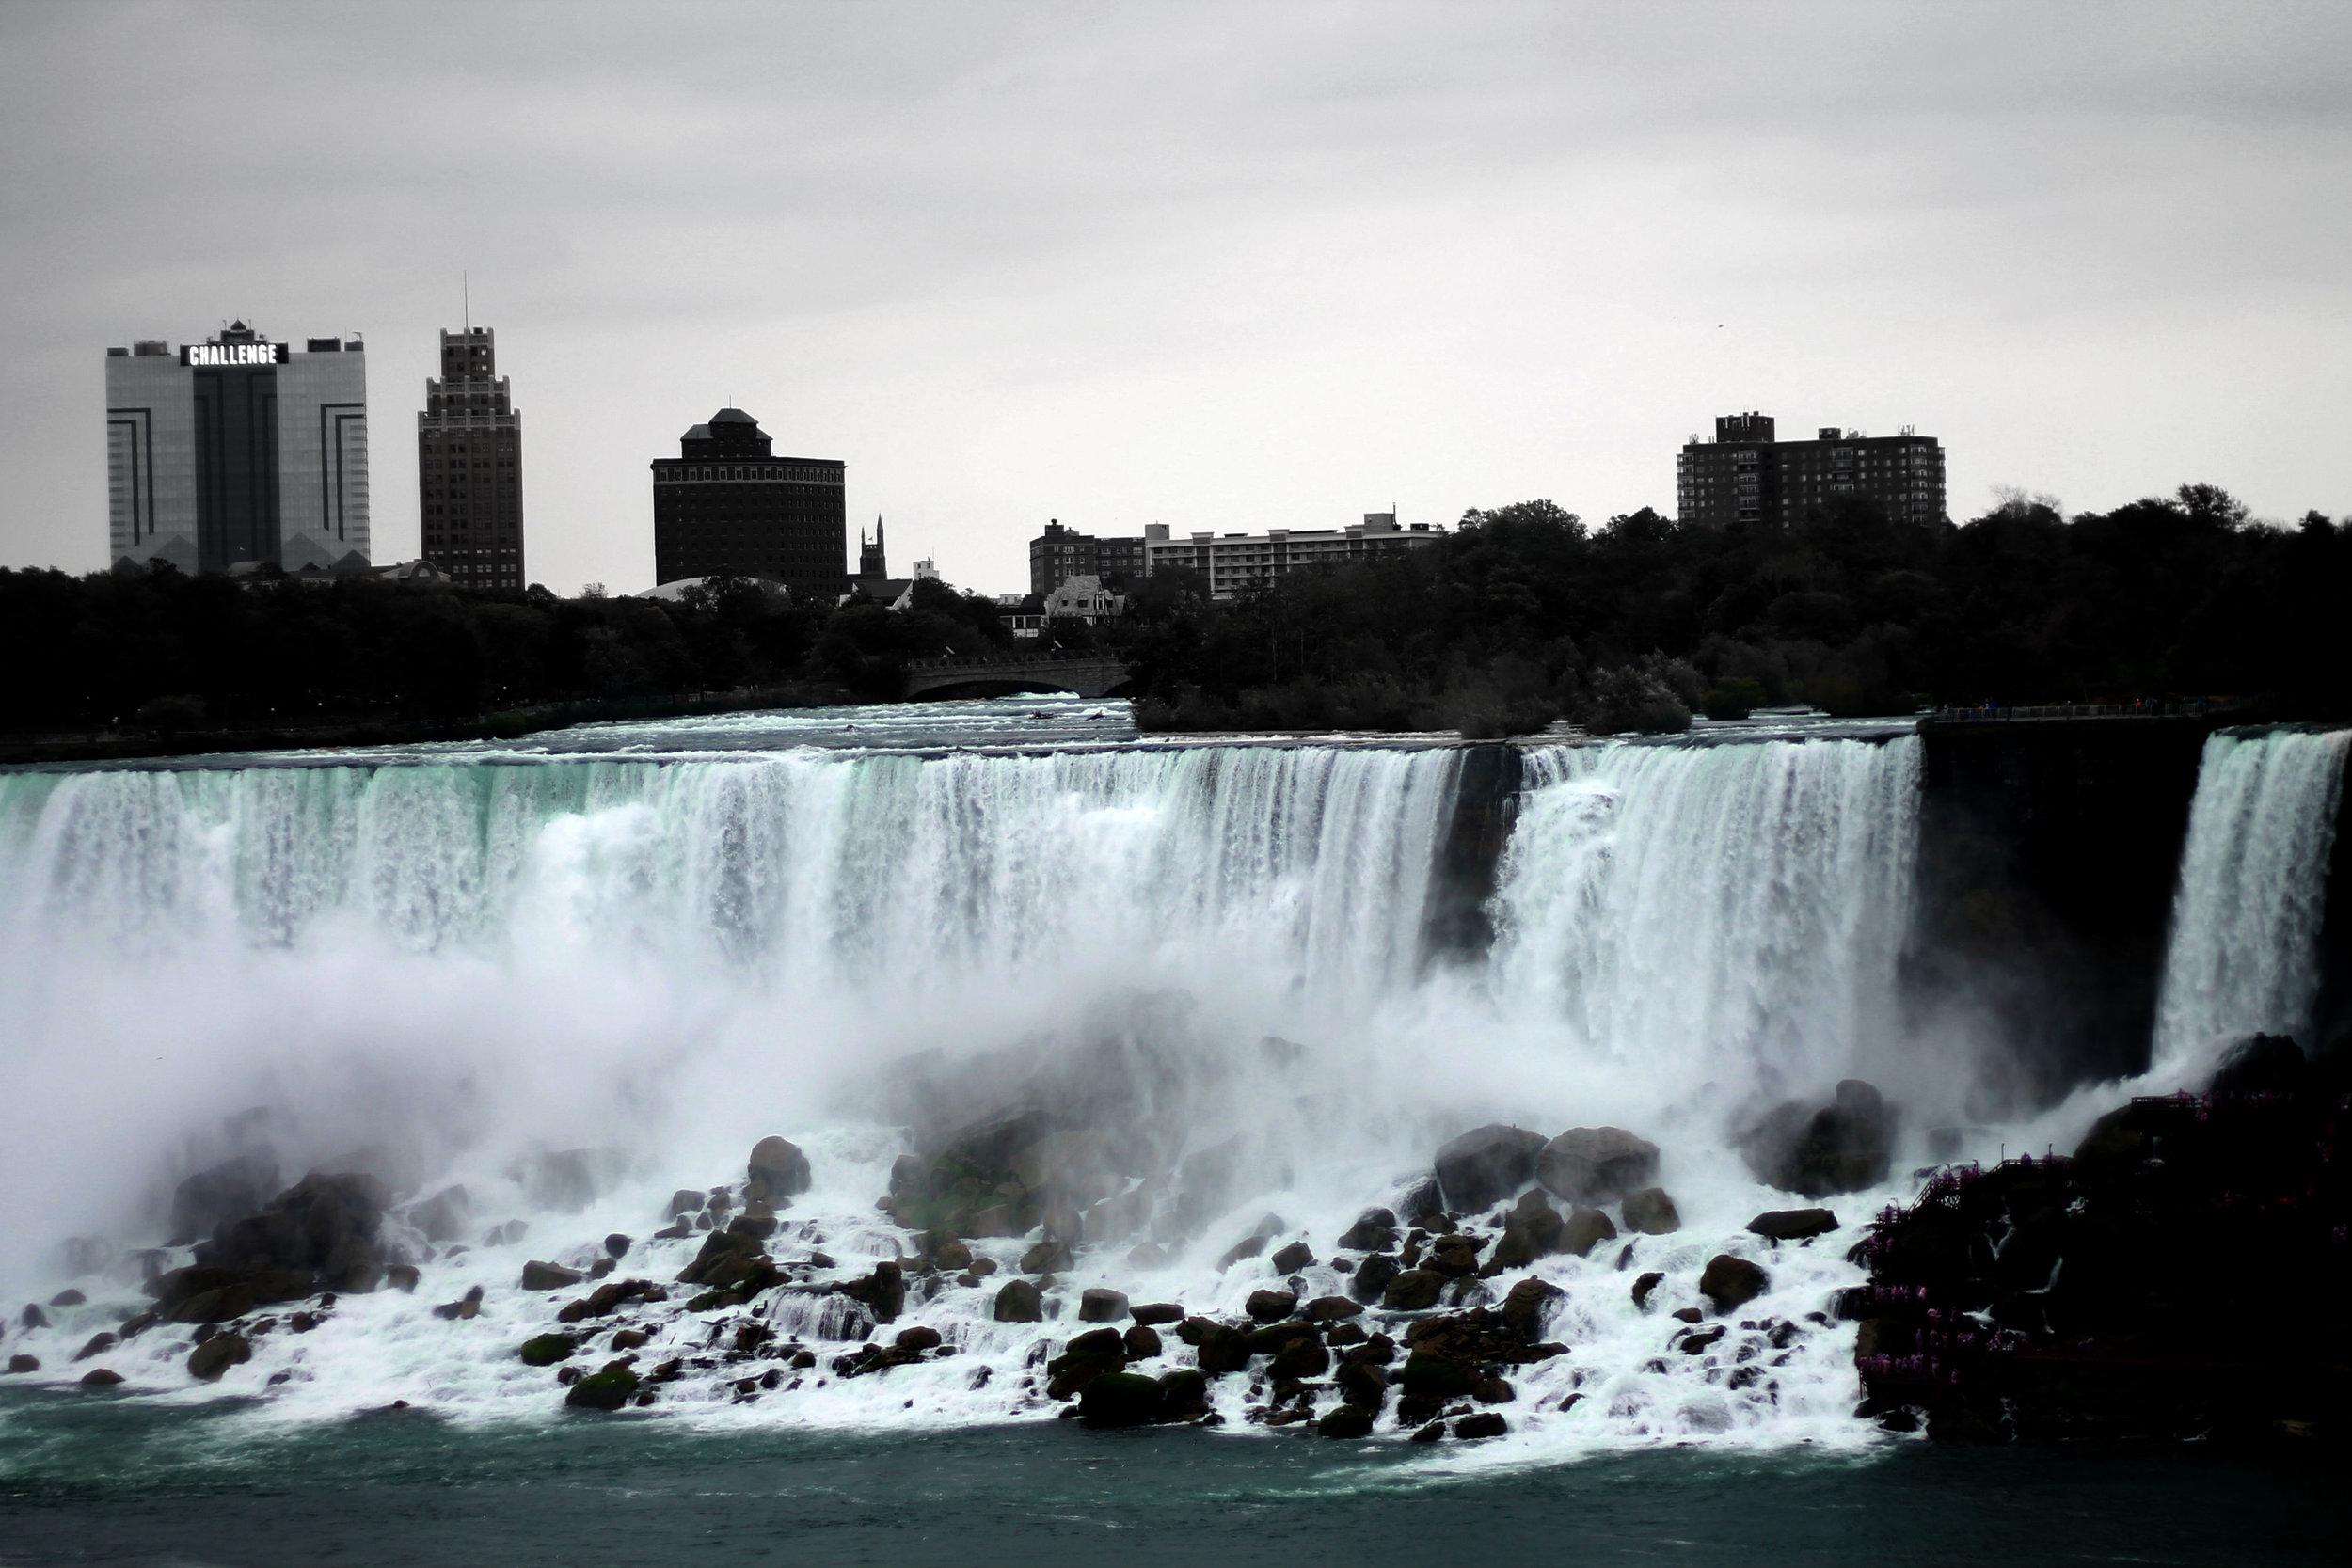 The American side of Niagara Falls, ON Canada taken by Bratty B